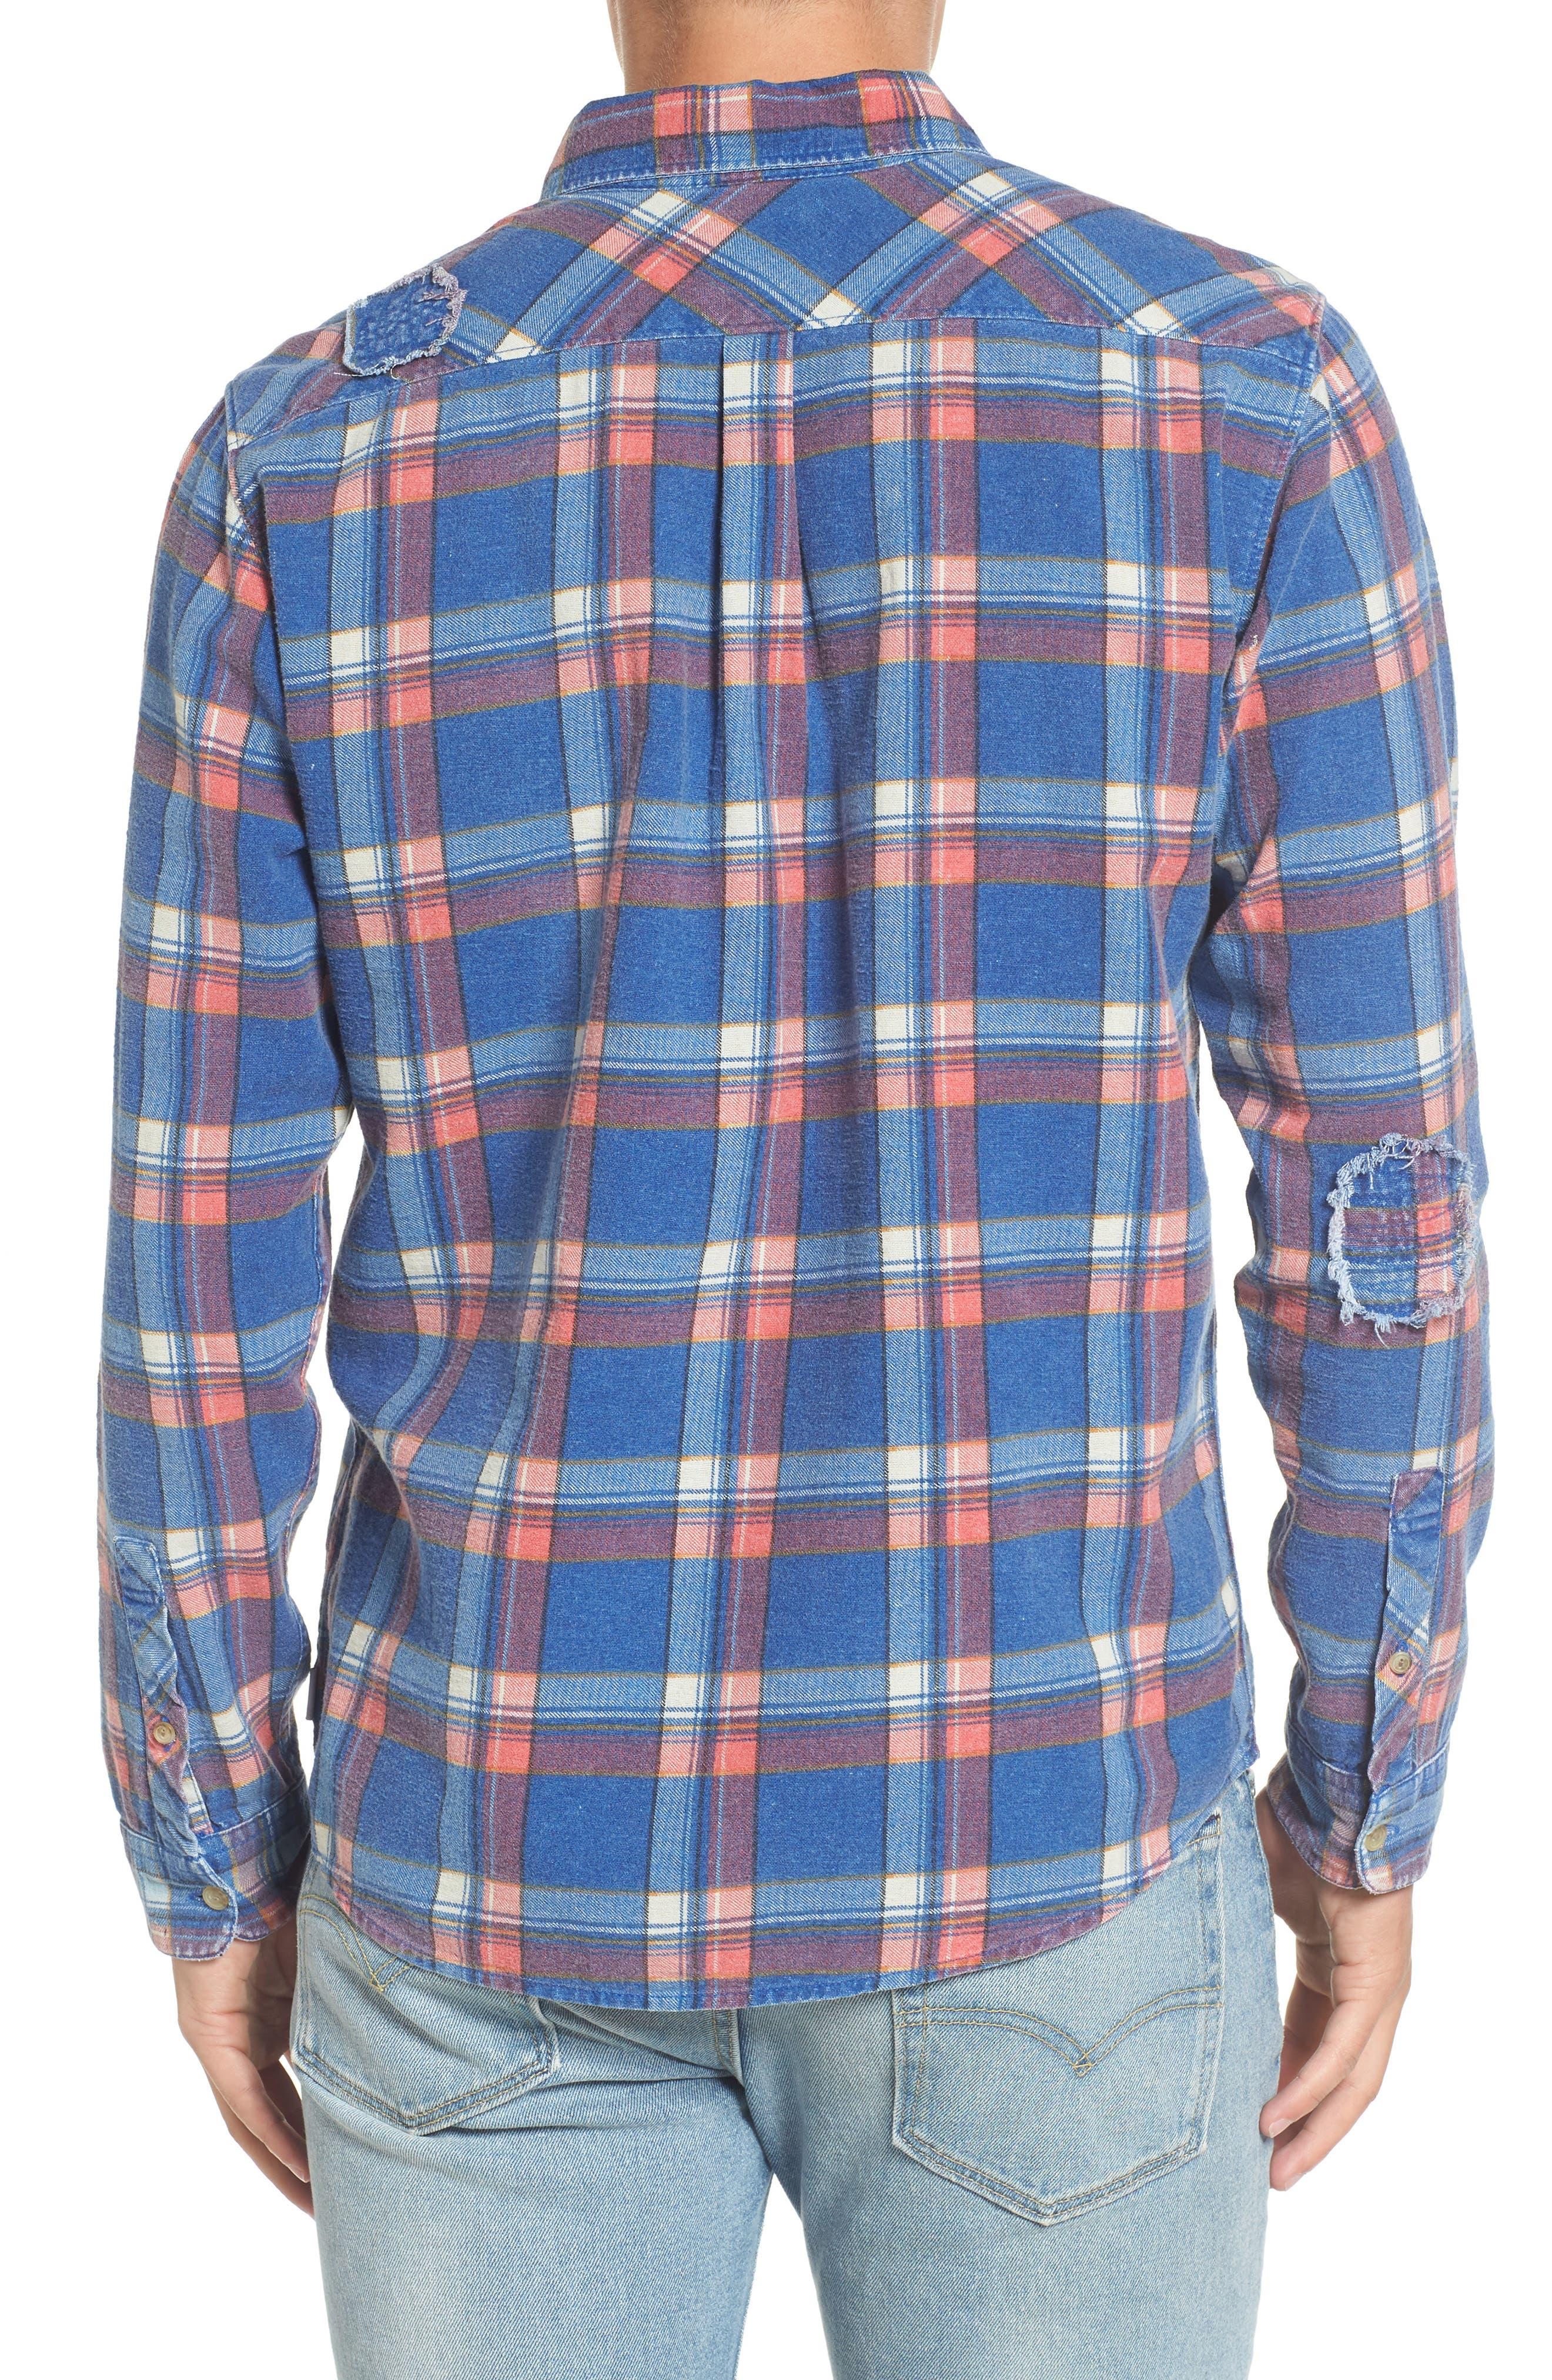 Alternate Image 2  - RVCA x Kevin Long Plaid Shirt